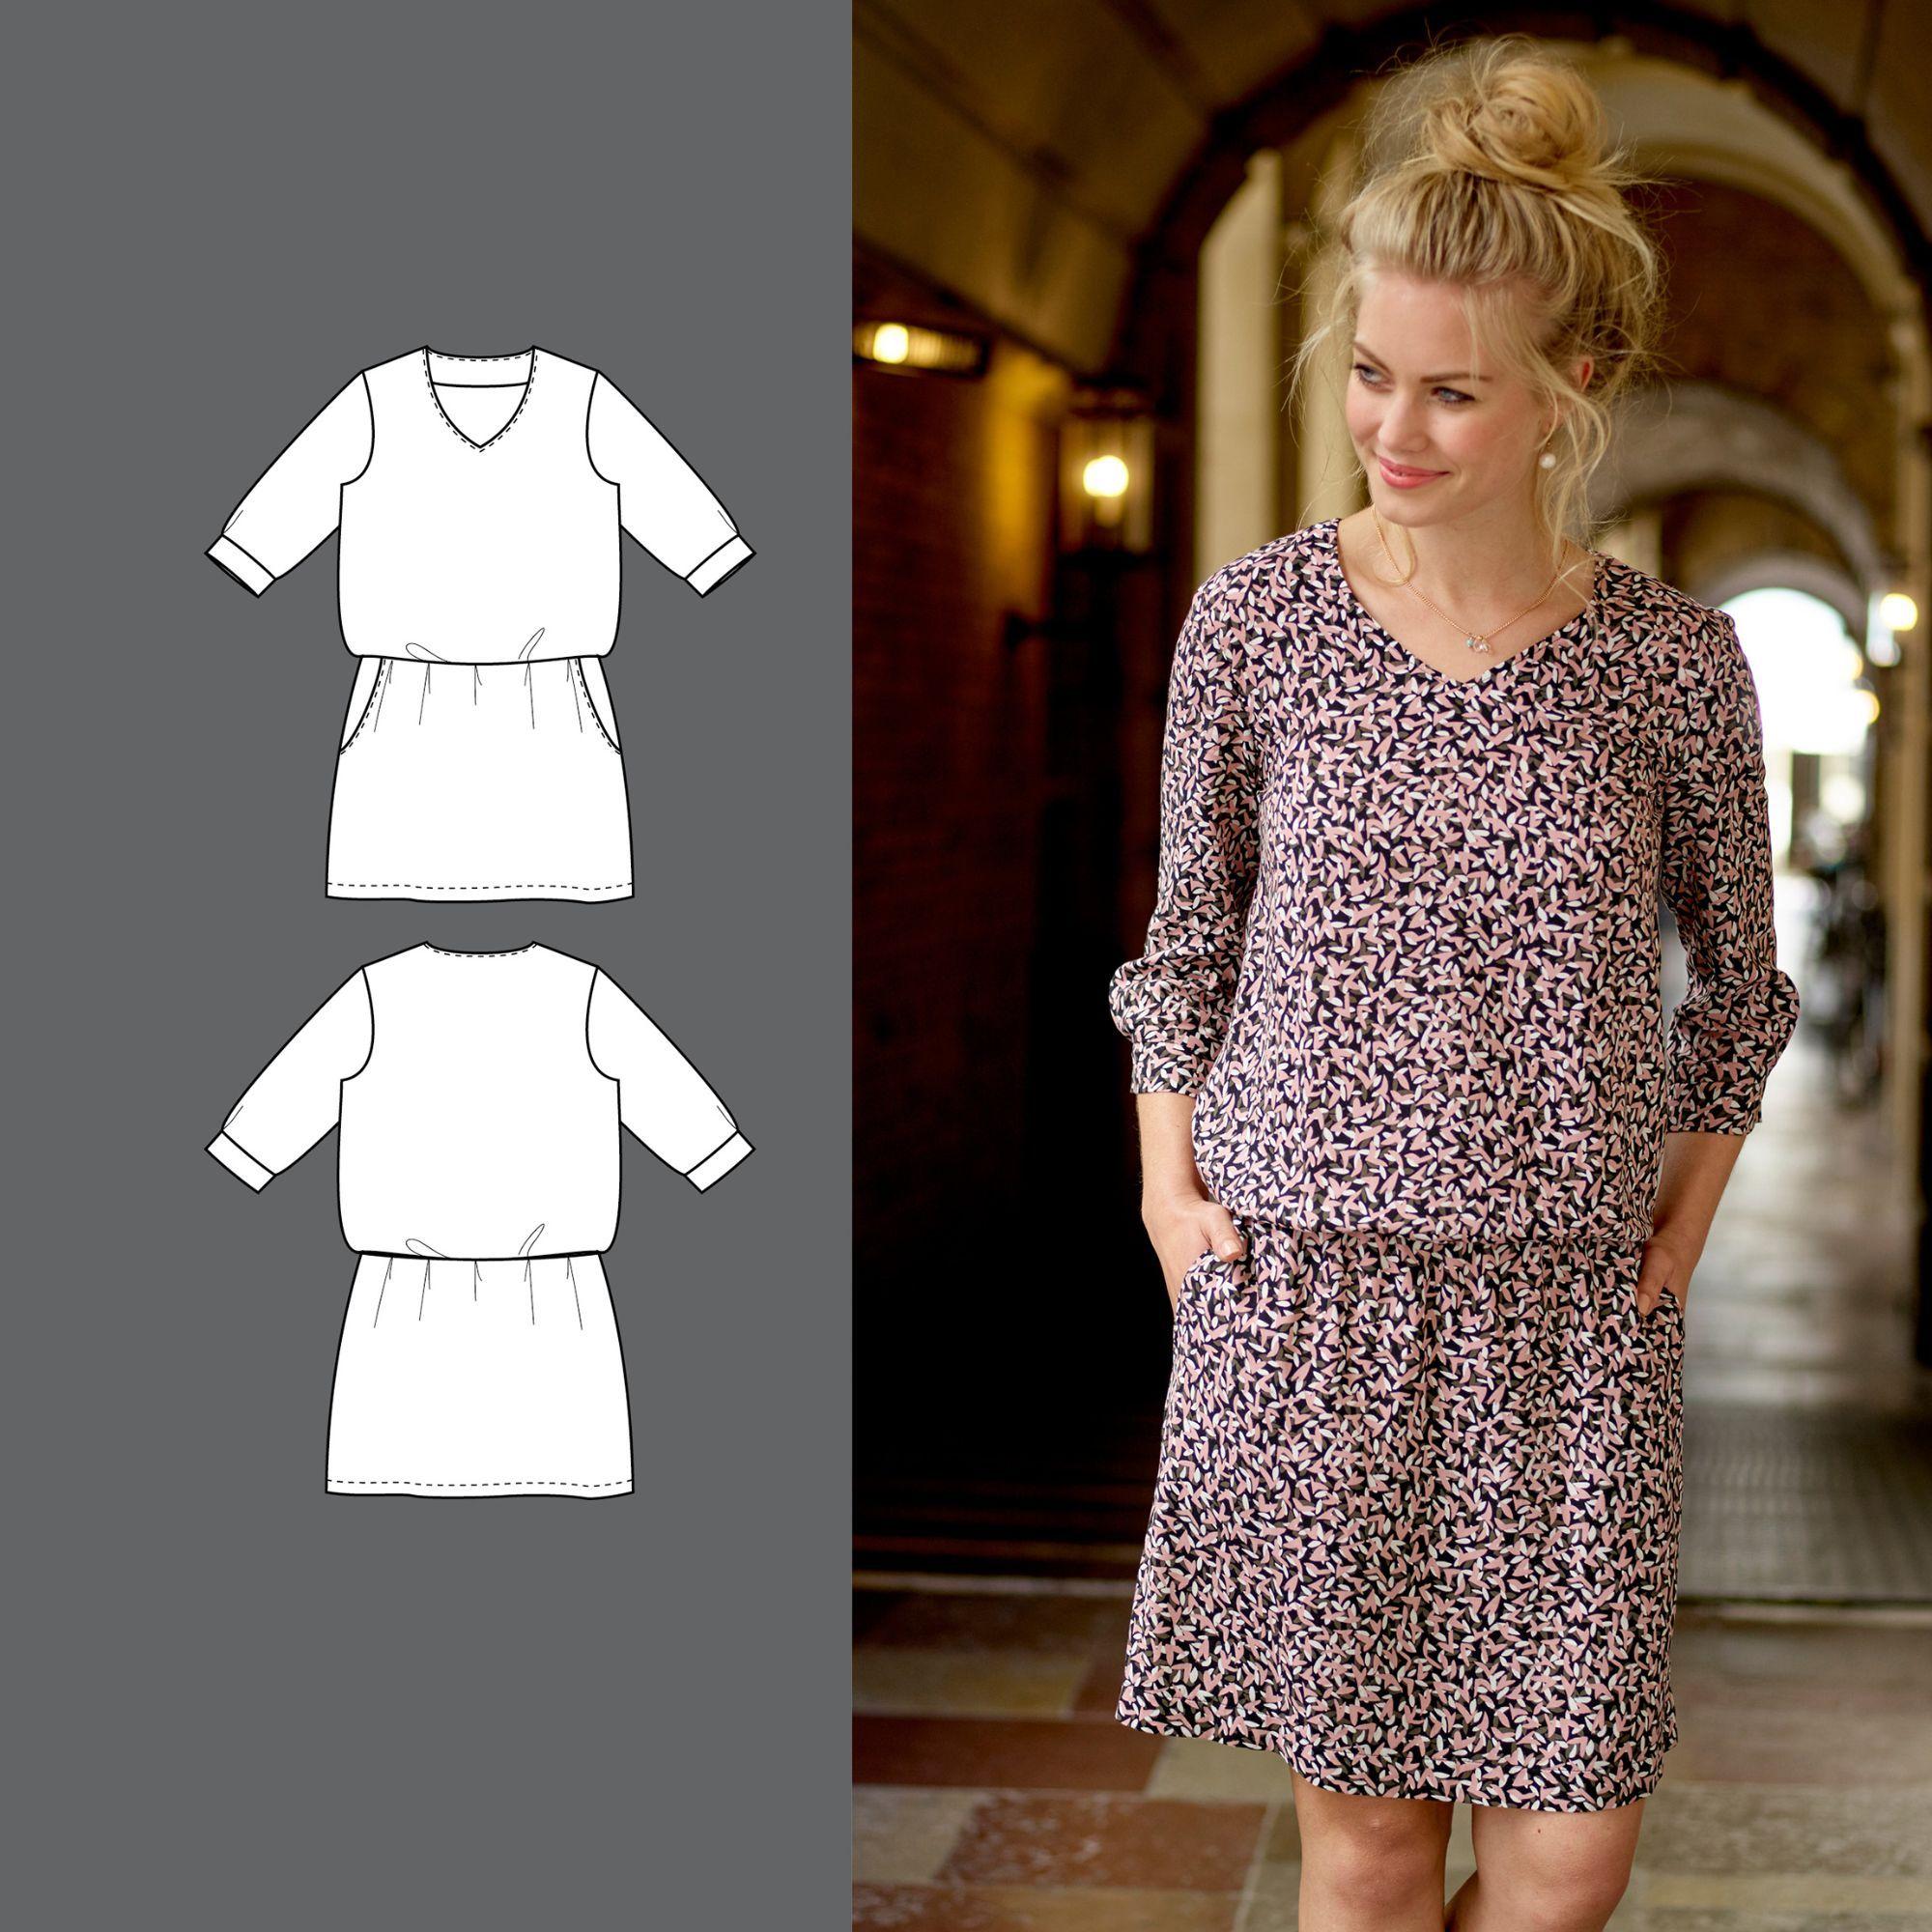 Kleid - STOFF & STIL | Nähen | Pinterest | Stoff stil, Stoffe und Stil